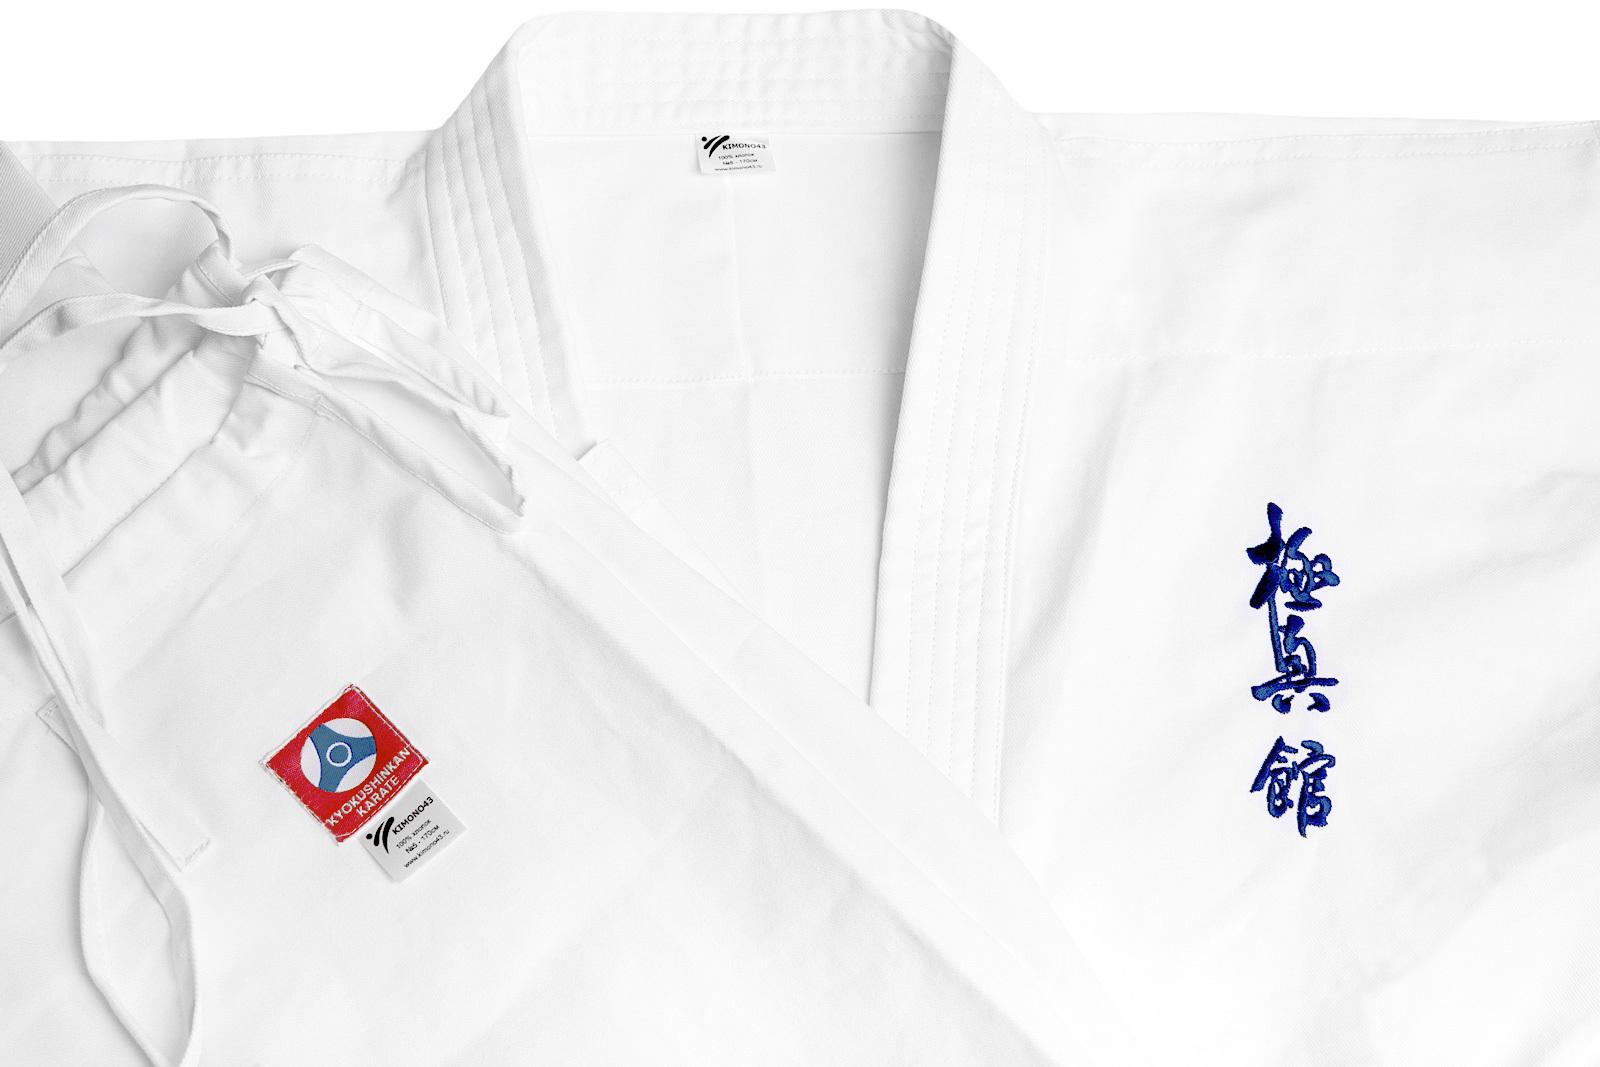 Кимоно / Доги Доги BFS - KYOKUSHINKAN / Standard dogi_kyokushinkan_1.jpg